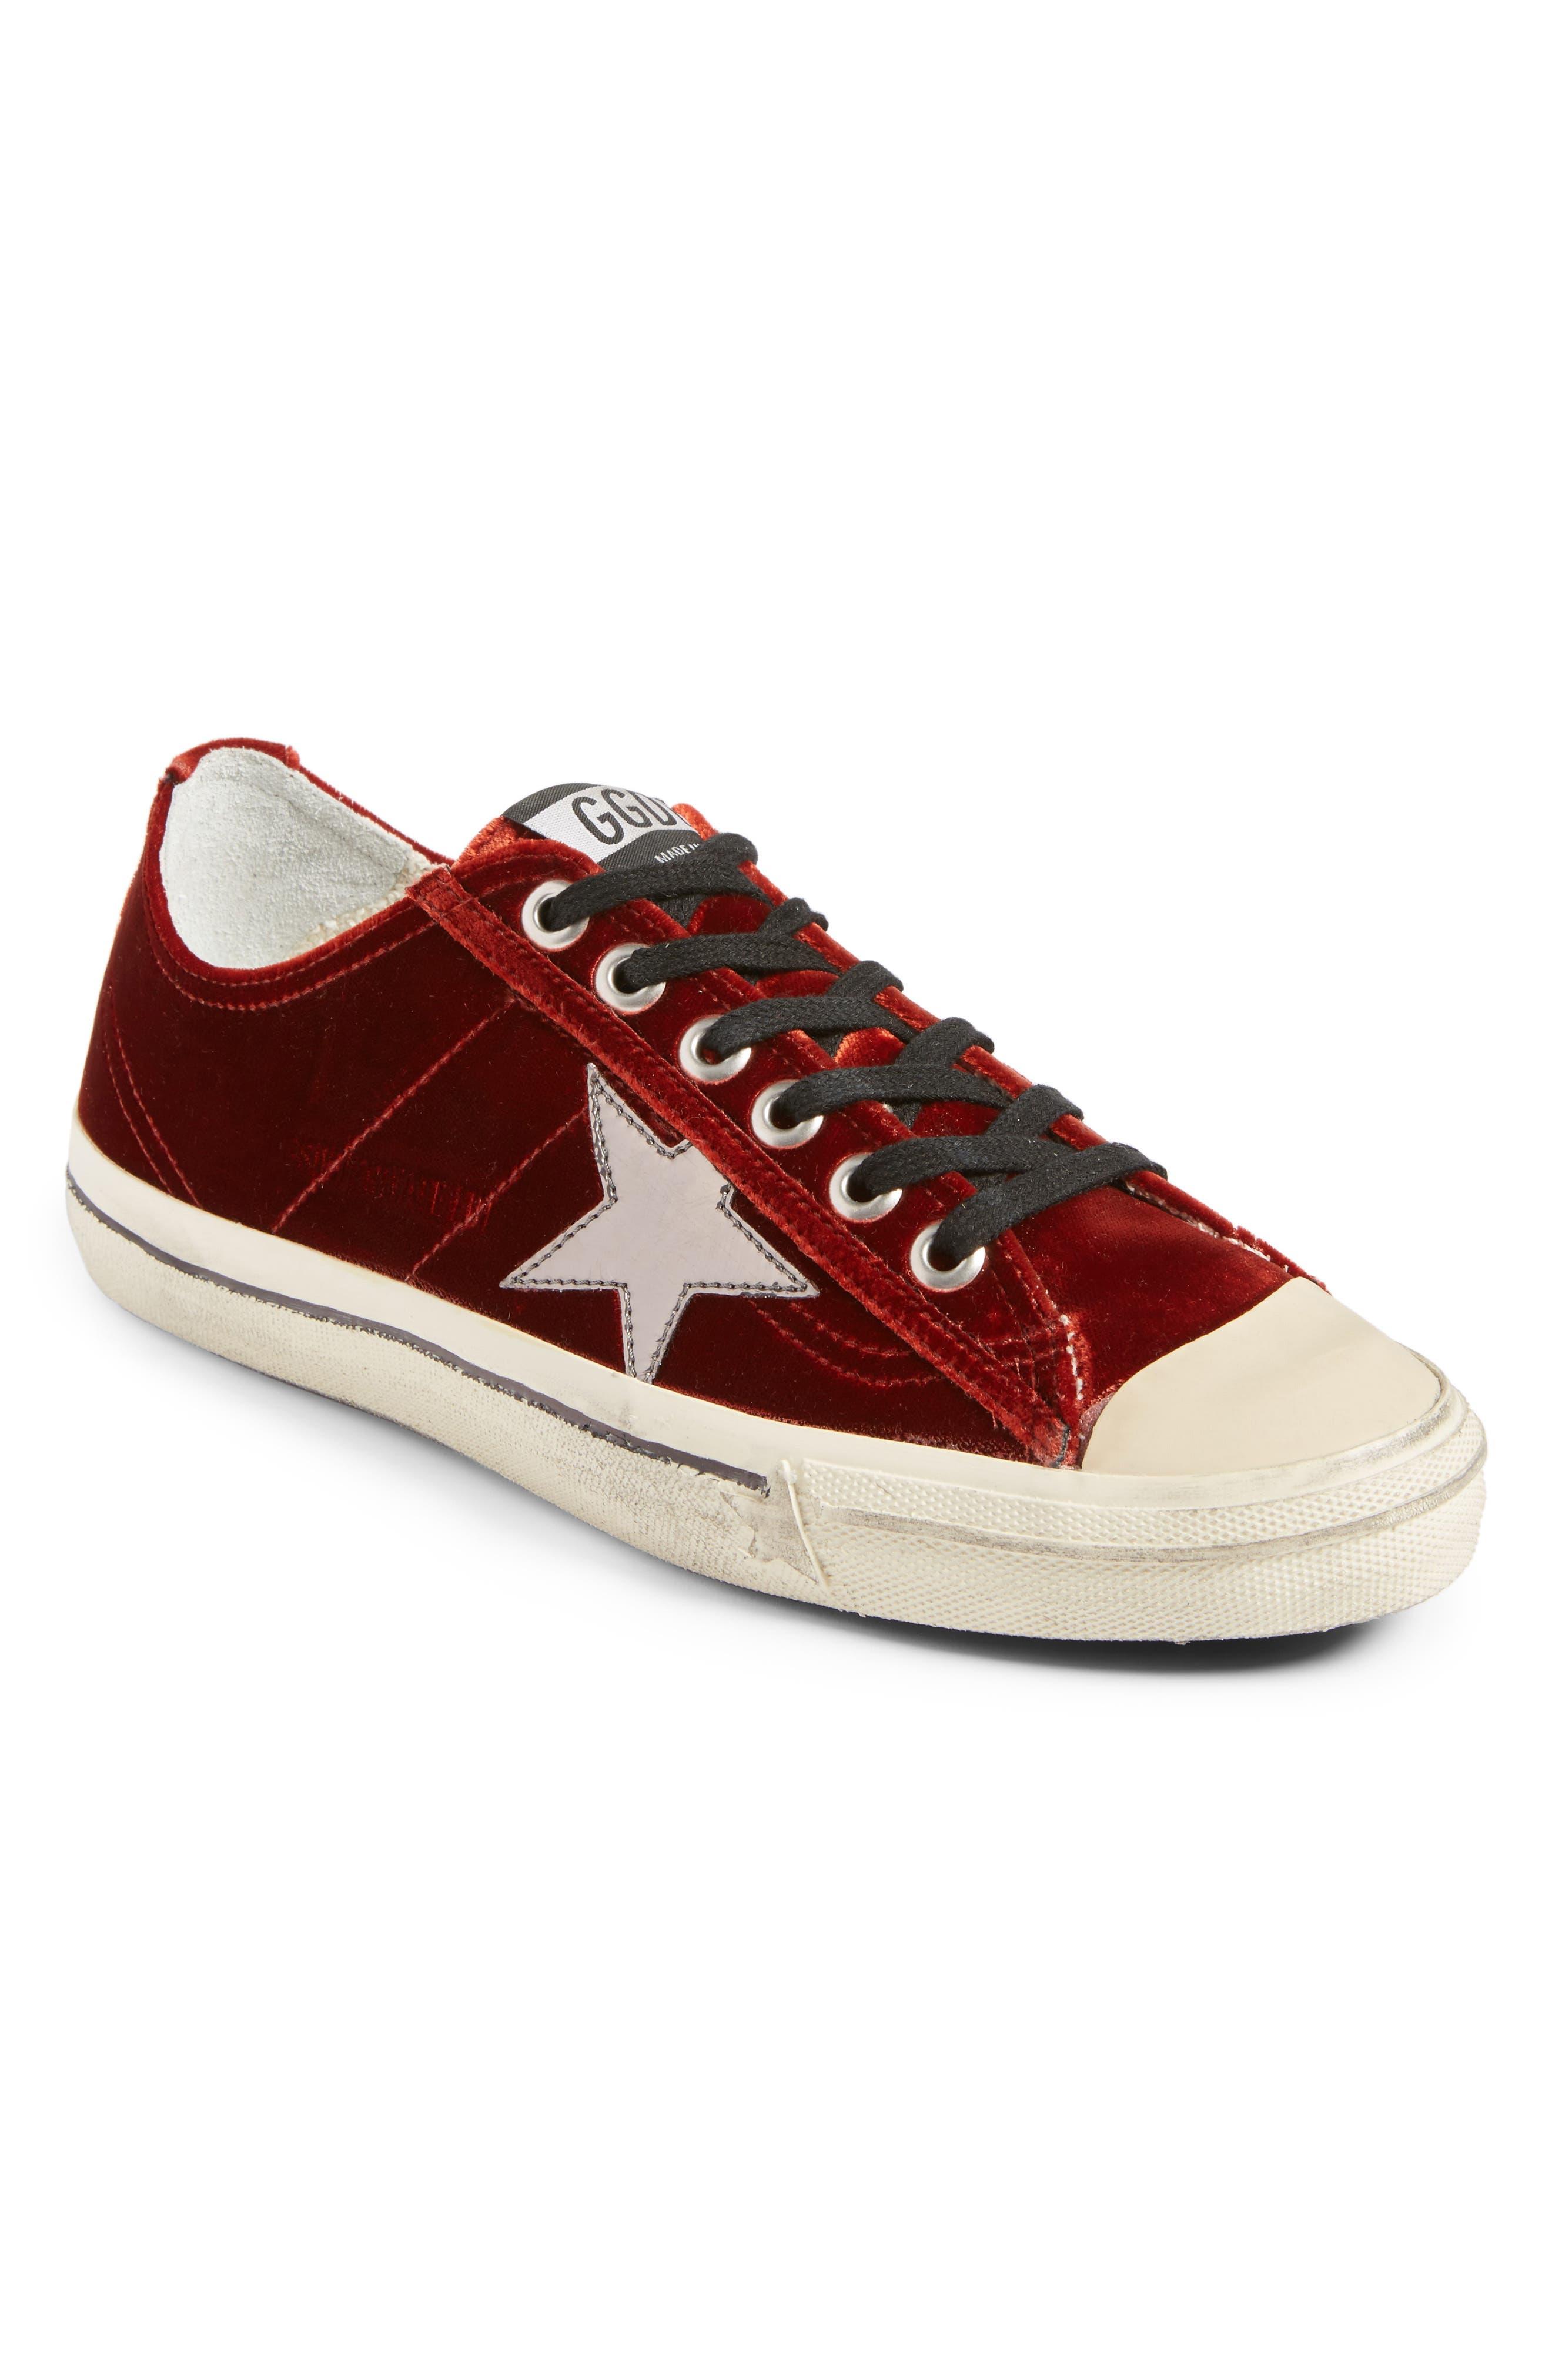 V-Star 2 Low Top Sneaker,                         Main,                         color, 930